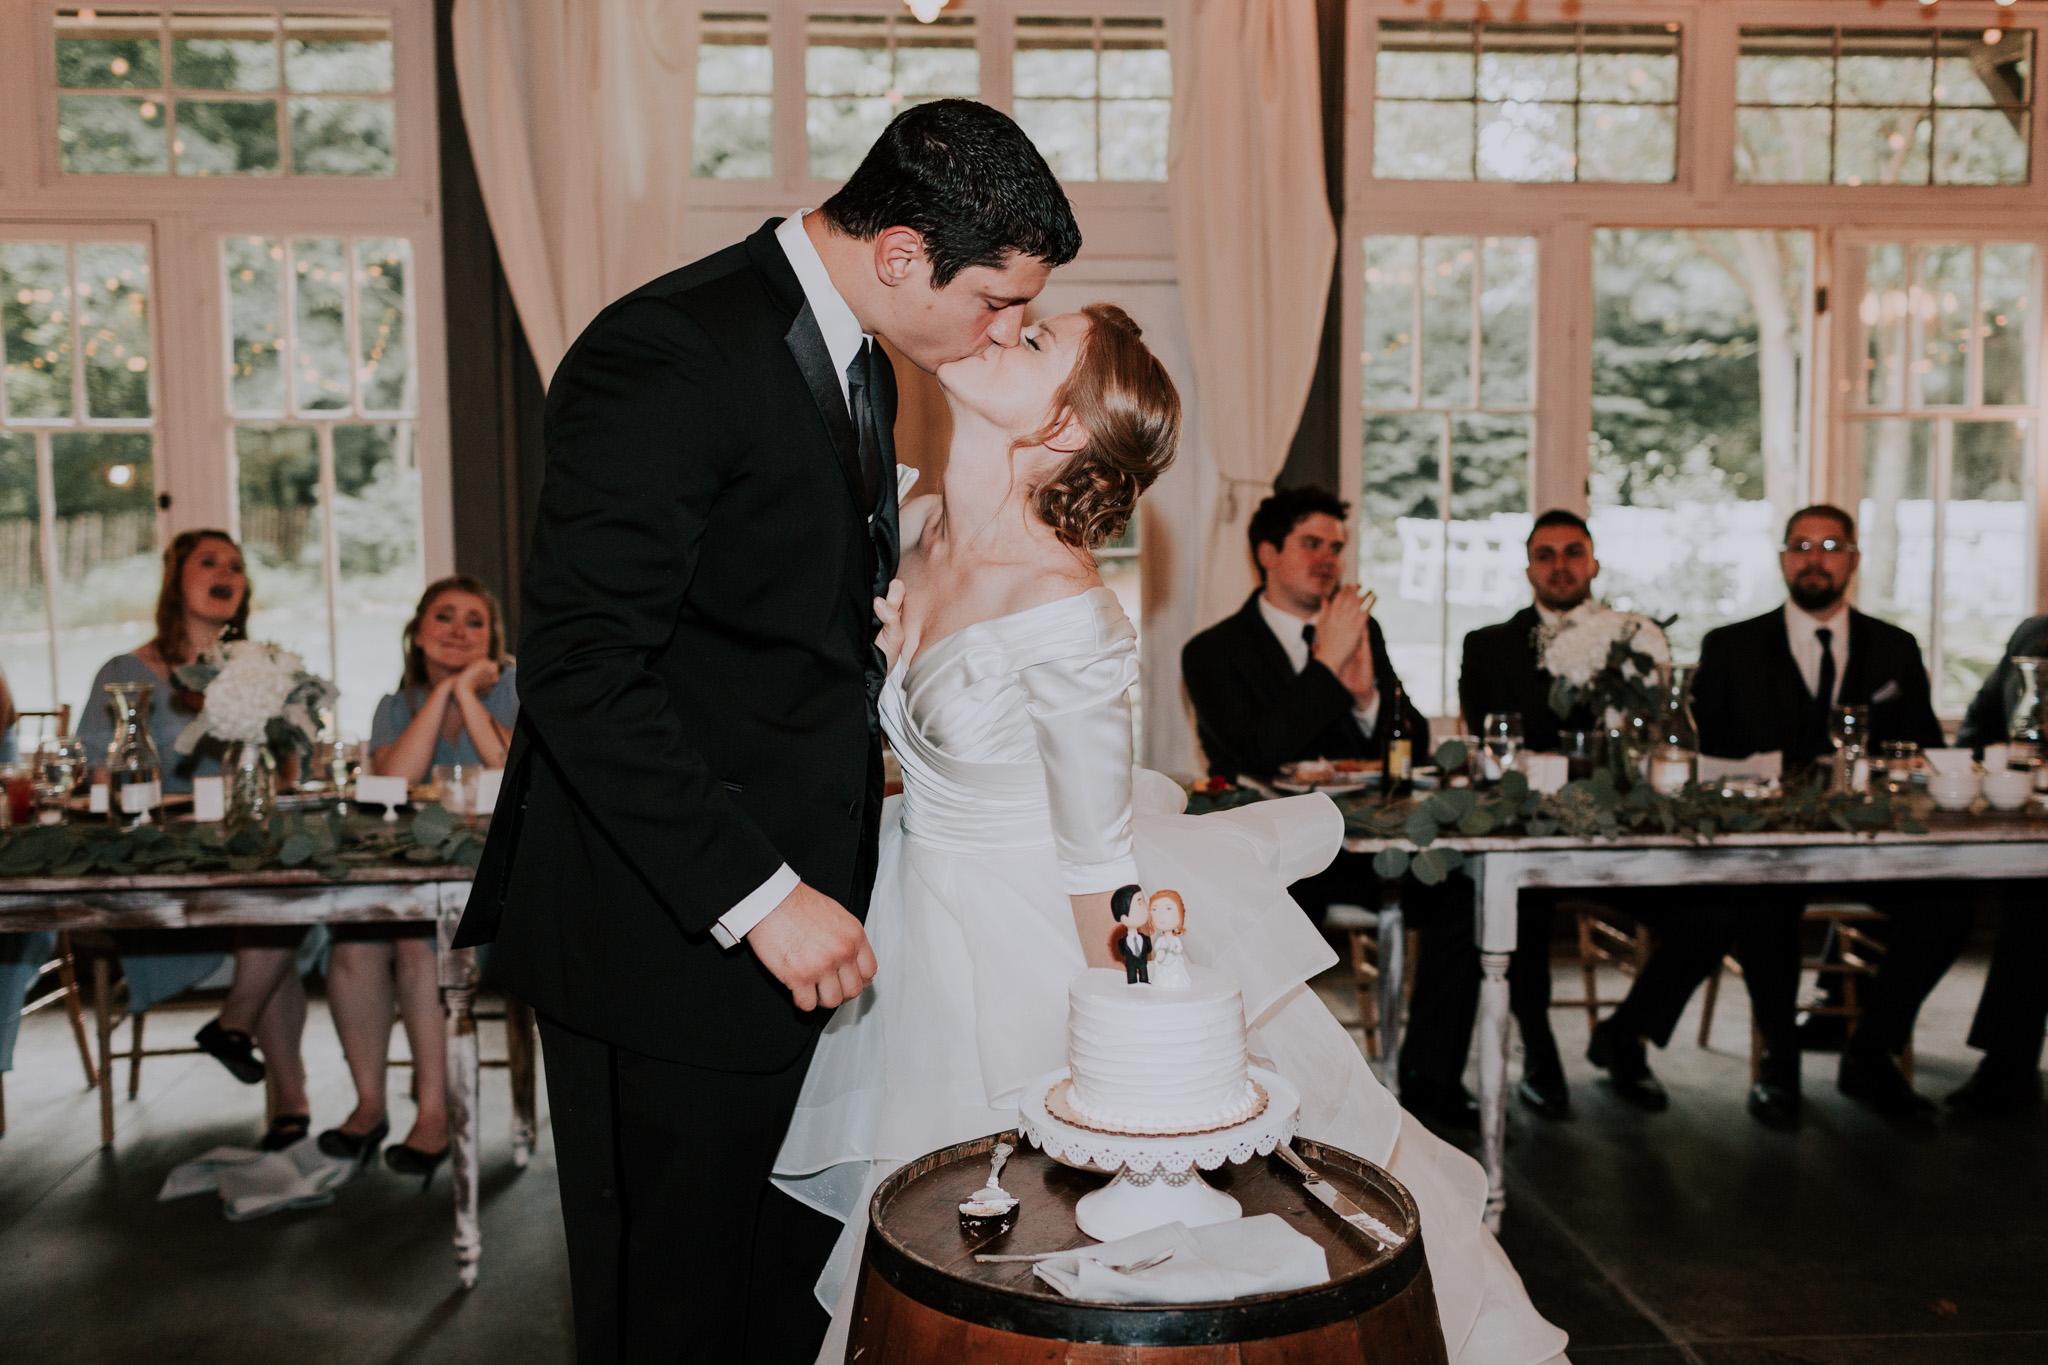 MillCreek-Wilde-Wedding-Barn-Michigan-Eliza-Eric-Vafa-Photo1060.jpg